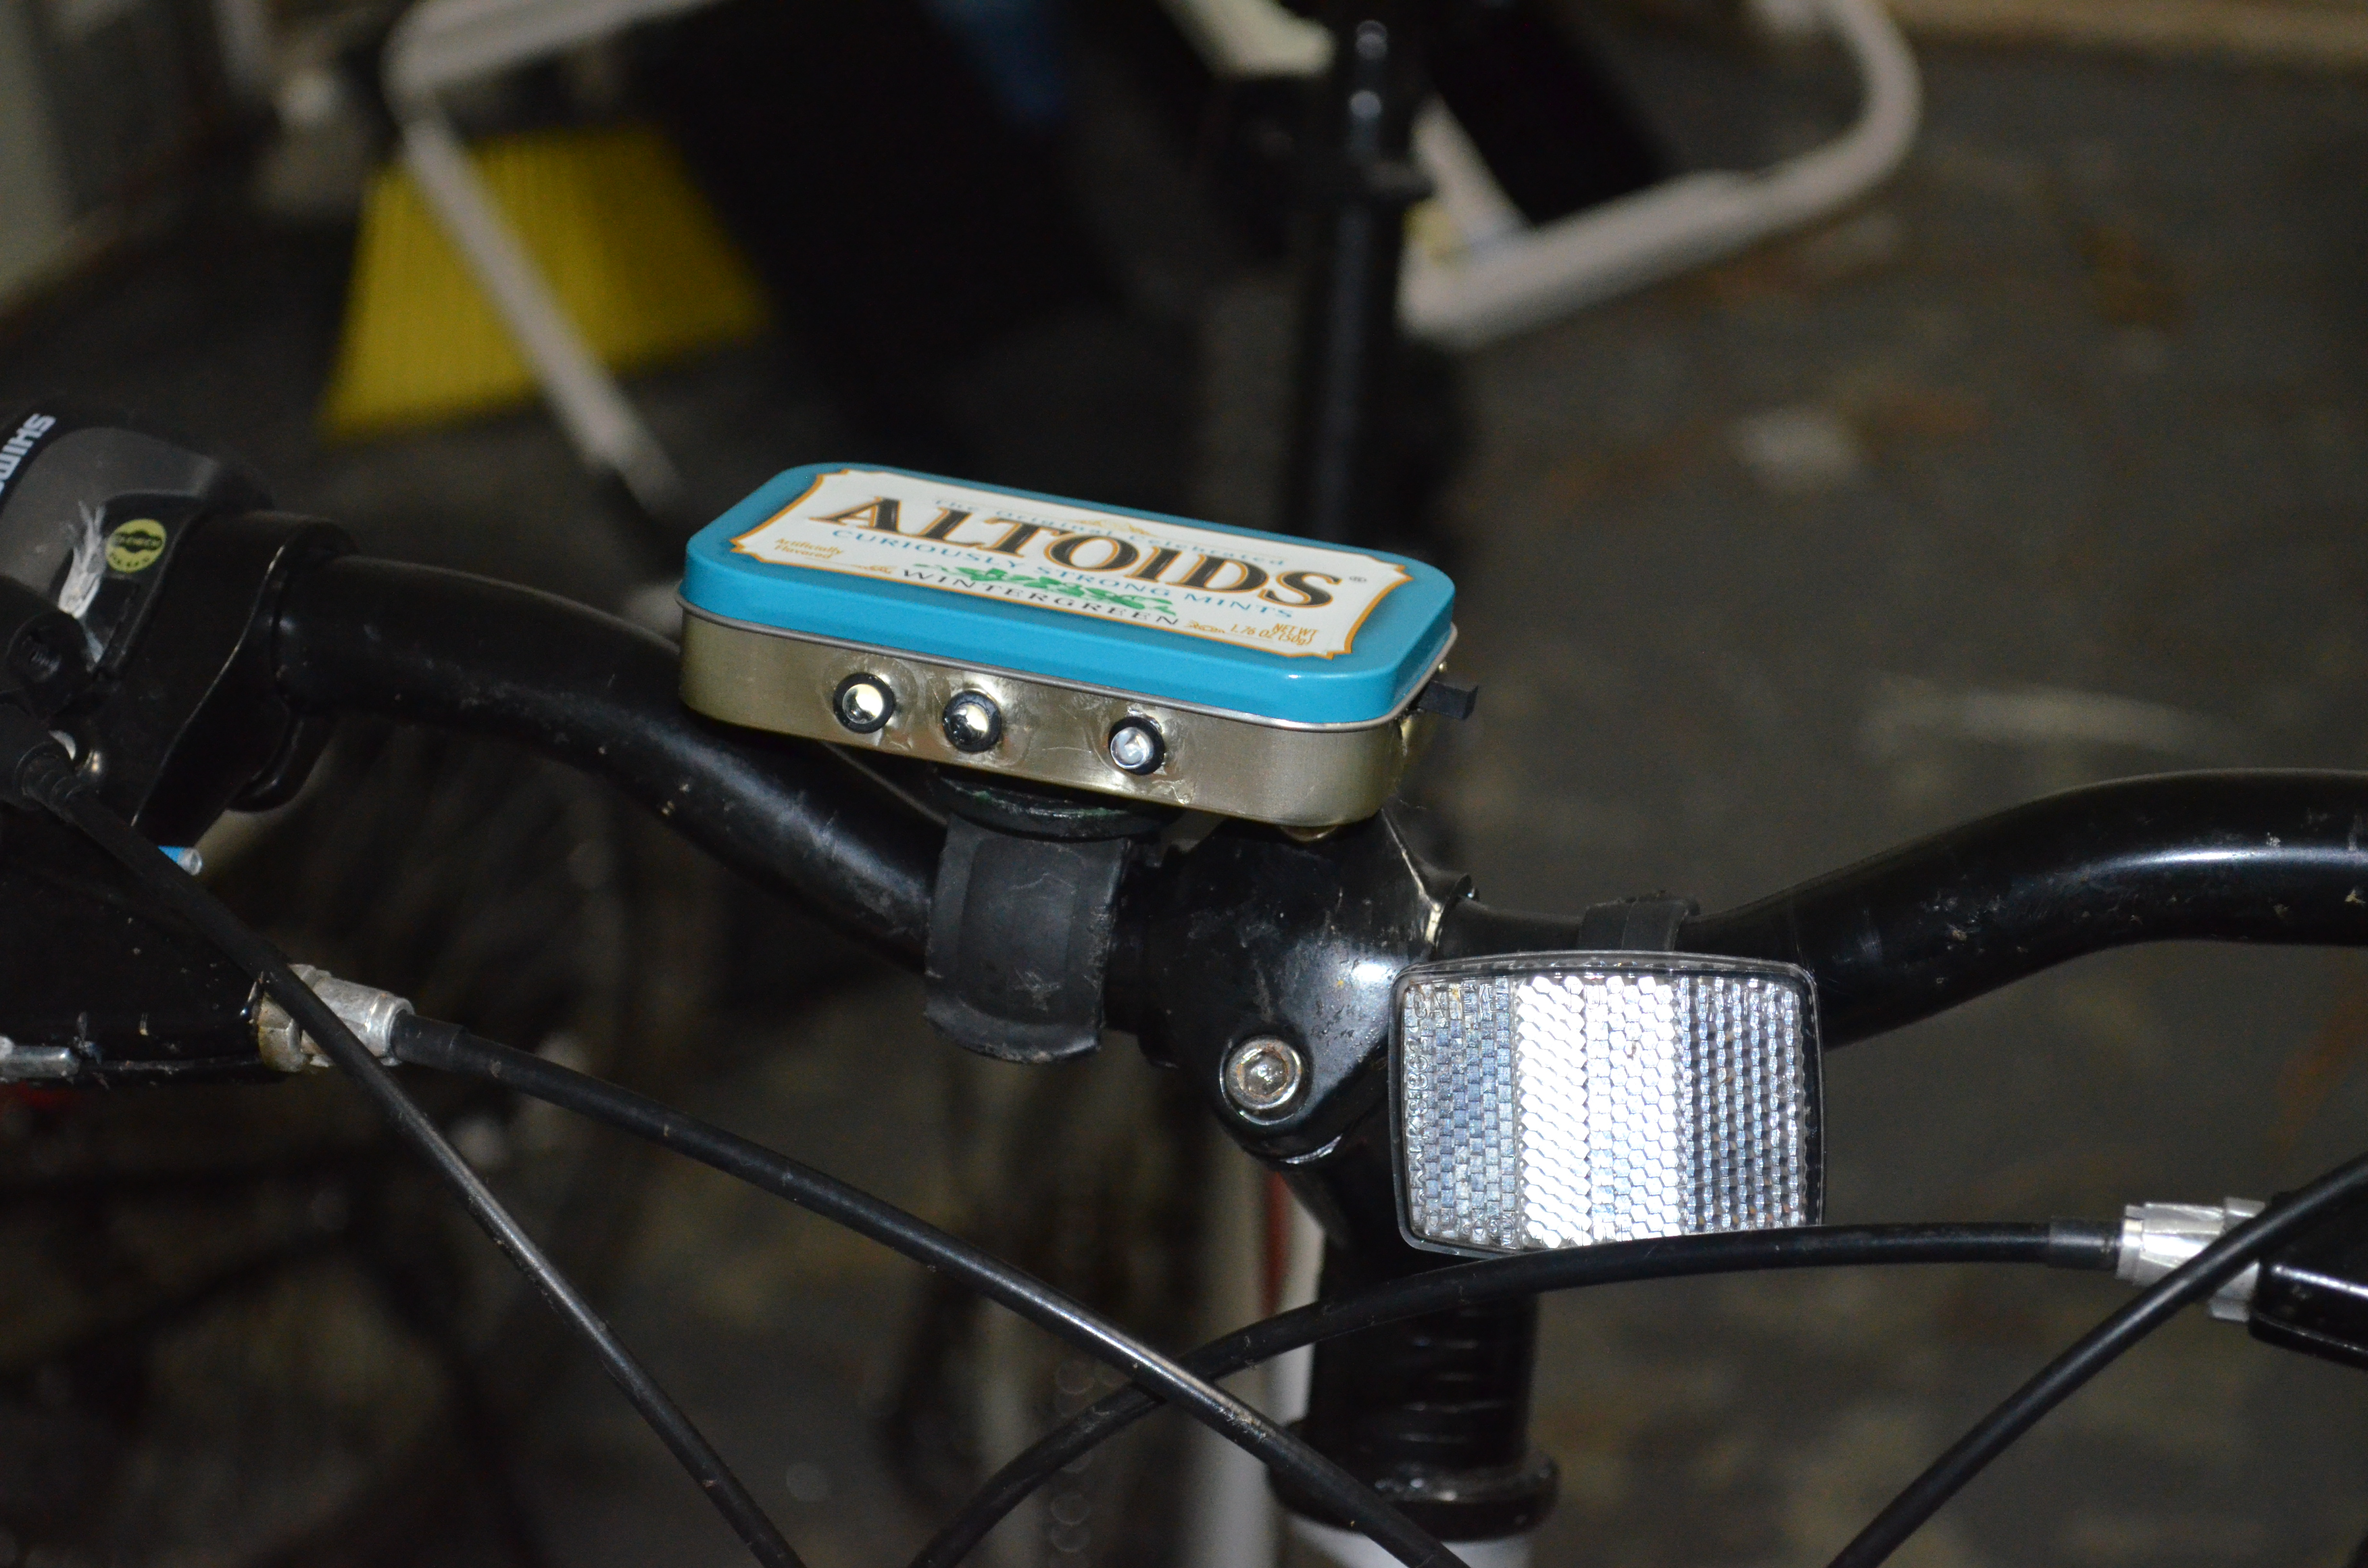 Altoids Bike Headlight On The Cheap!